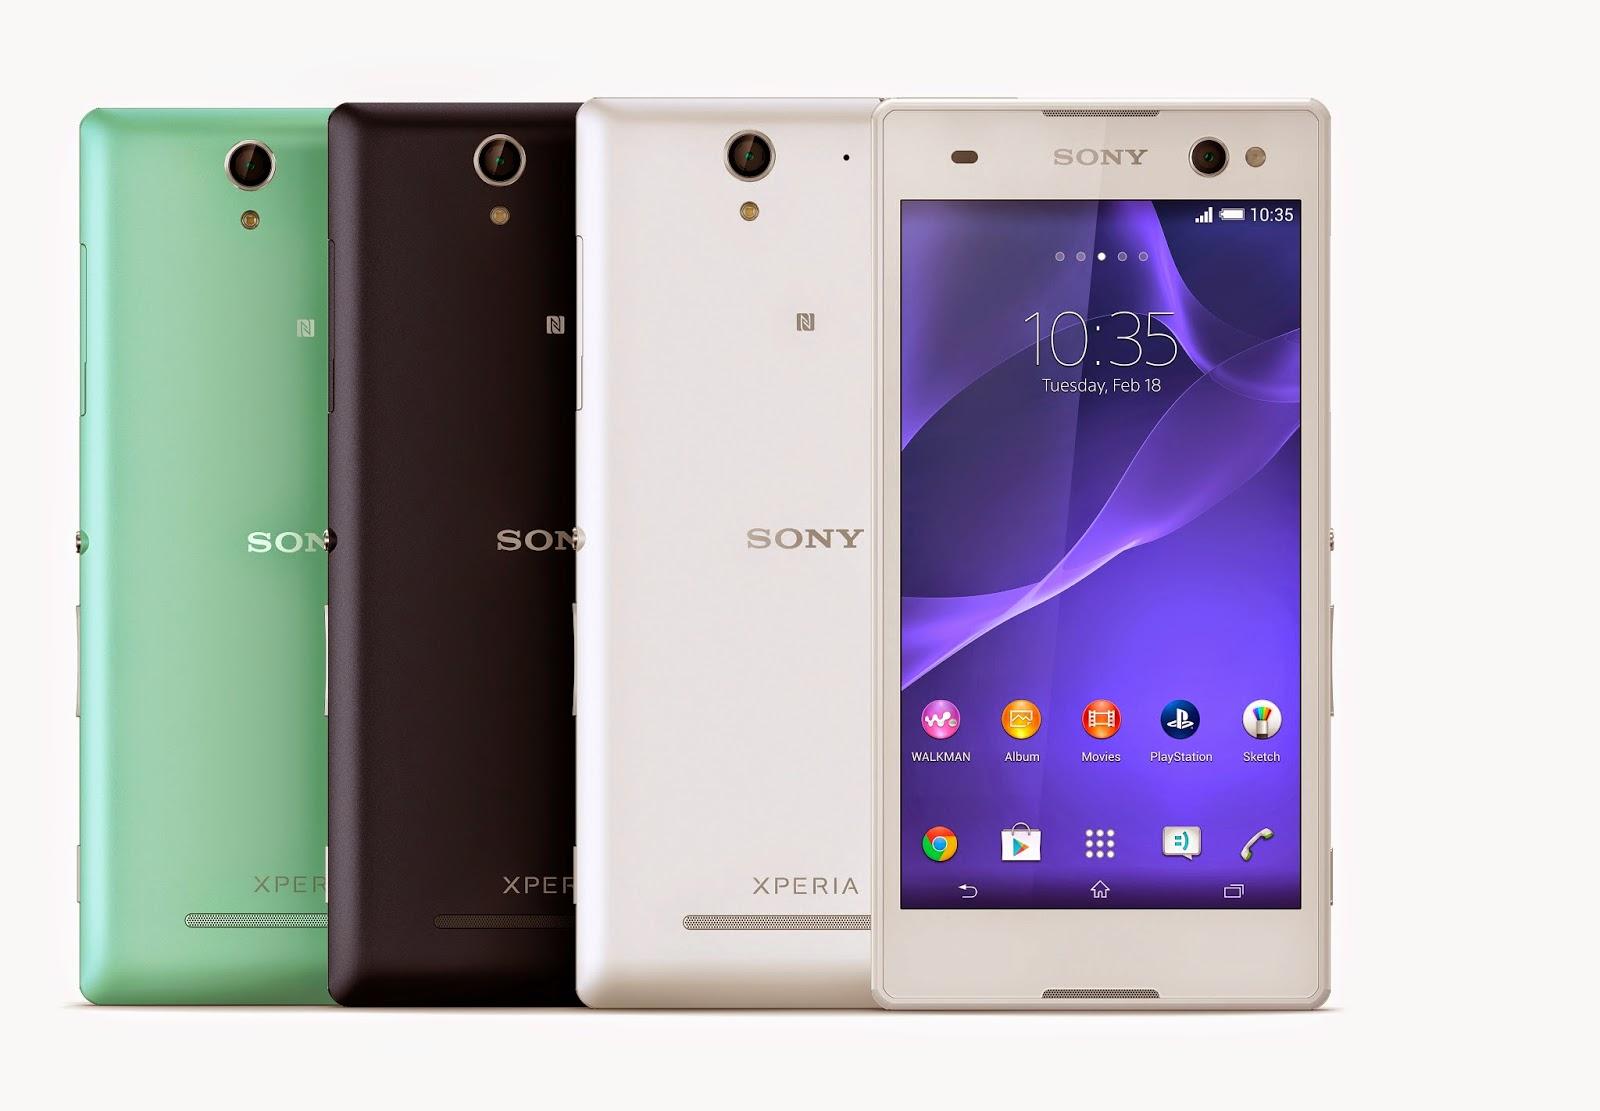 Harga dan Spesifikasi Sony Xperia C3